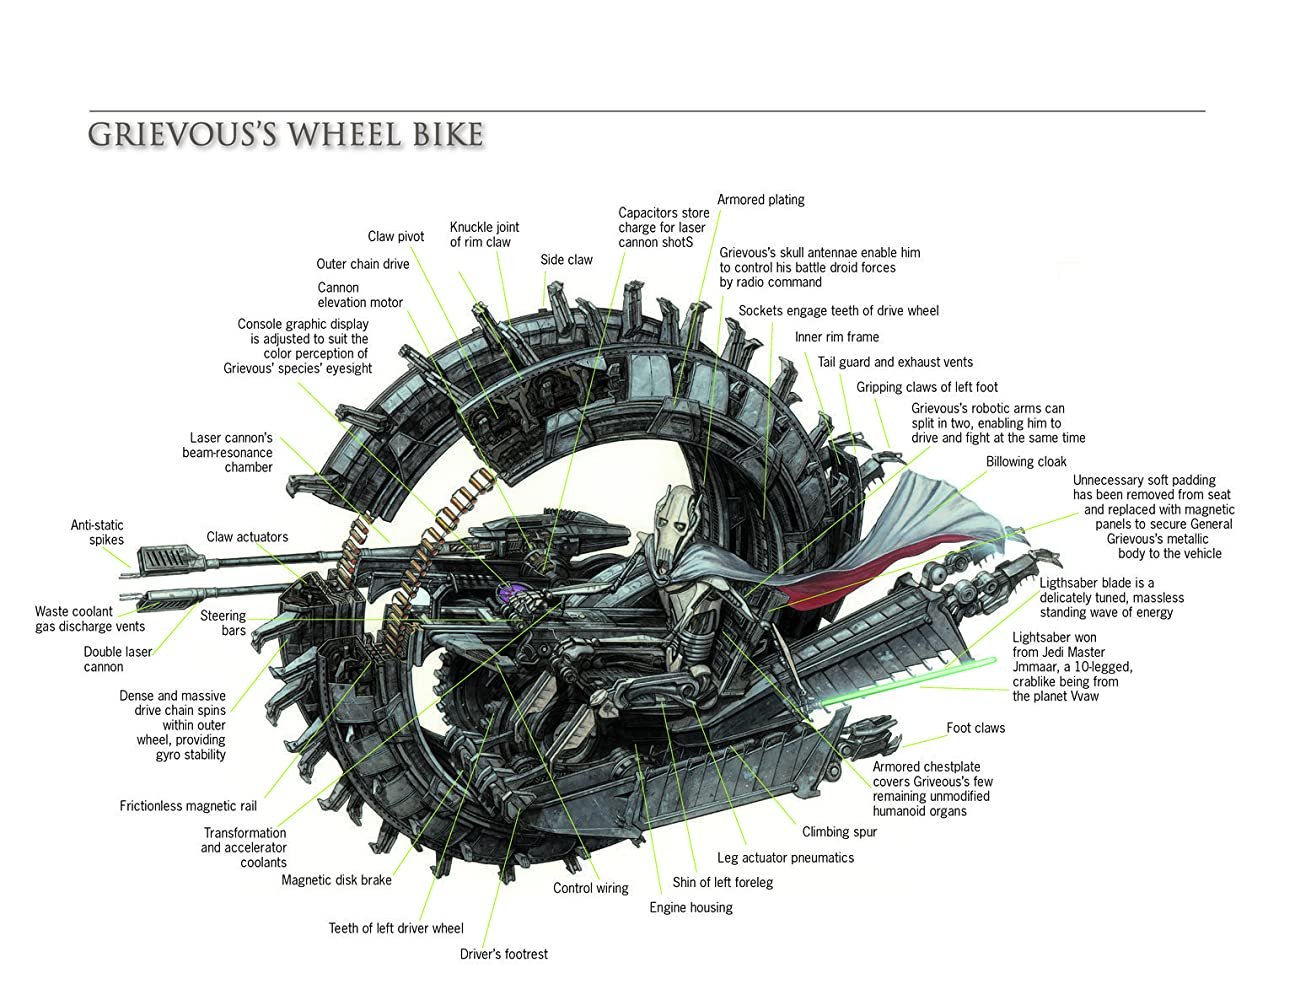 Star Wars Episode Iii Revenge Of The Sith 2005 Engine Housing Diagram